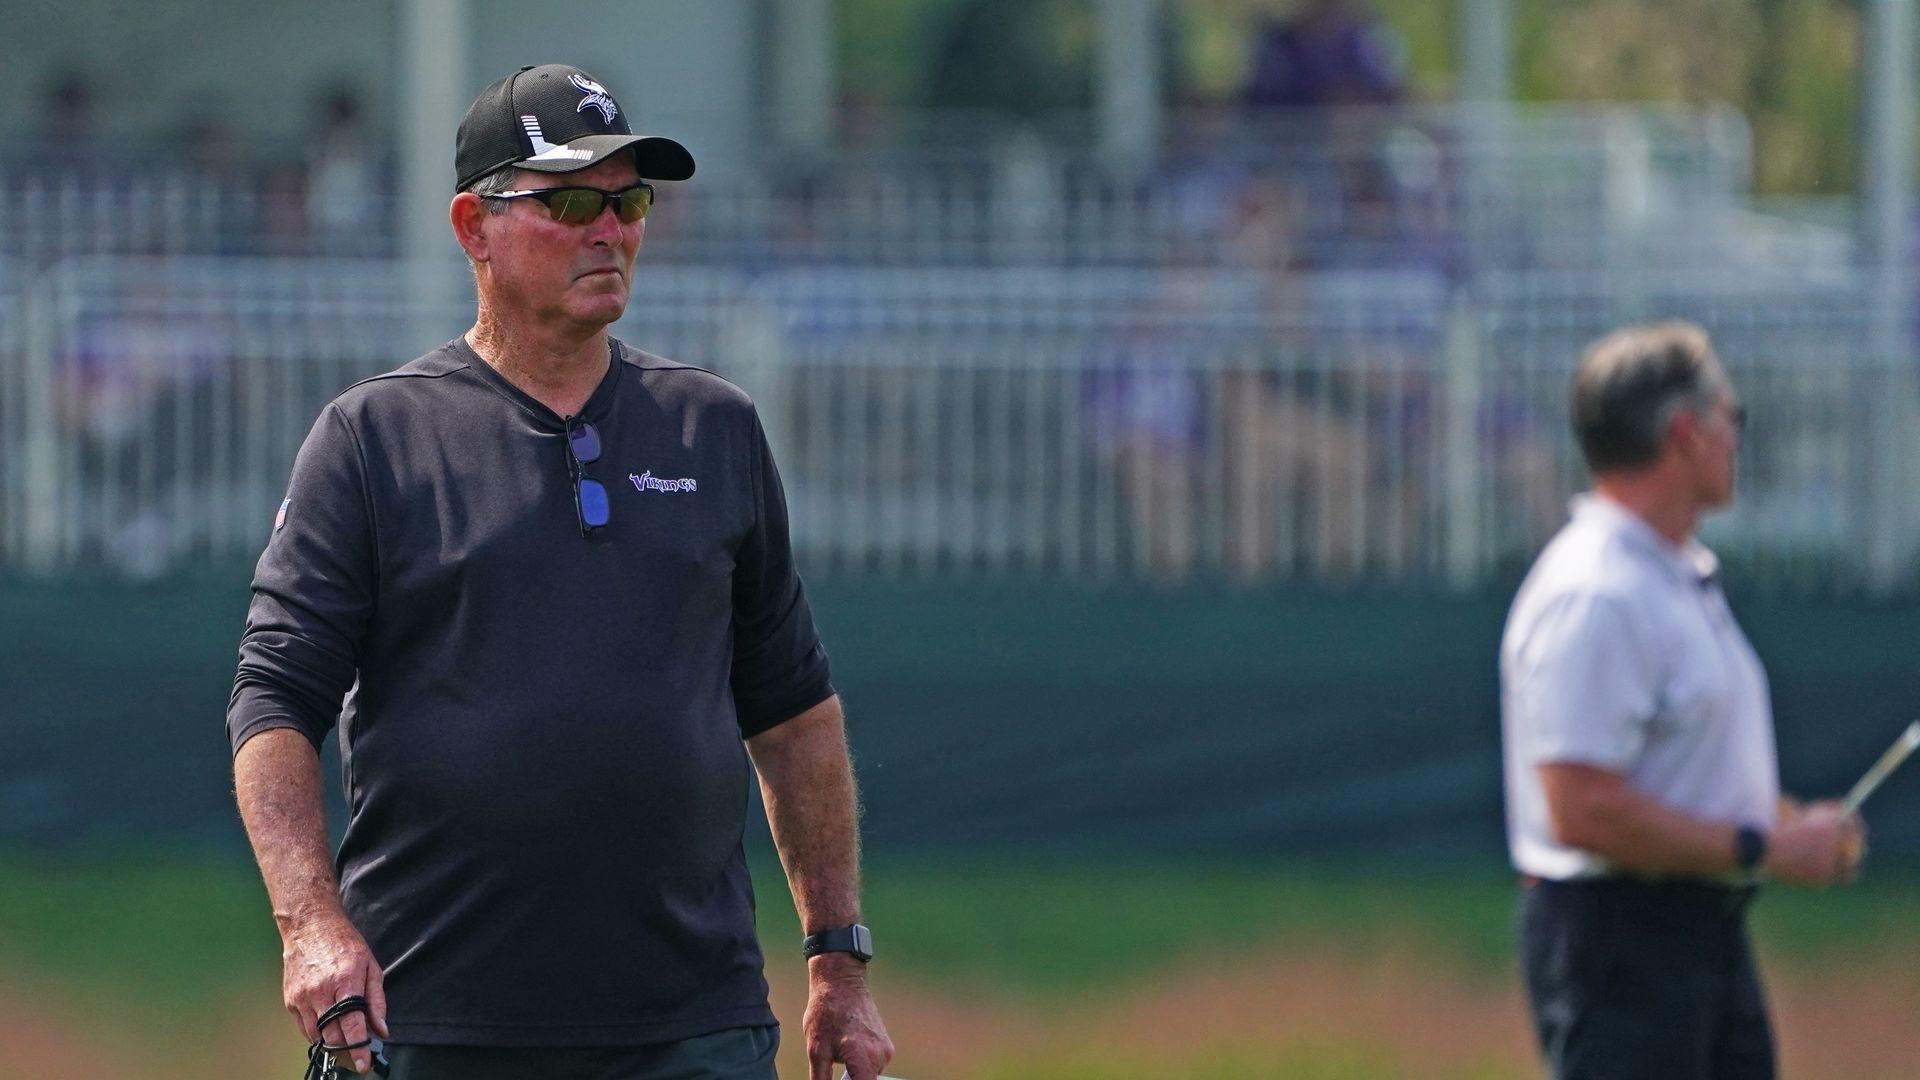 Minnesota Vikings head coach Mike Zimmer wears sunglasses while watching practice.